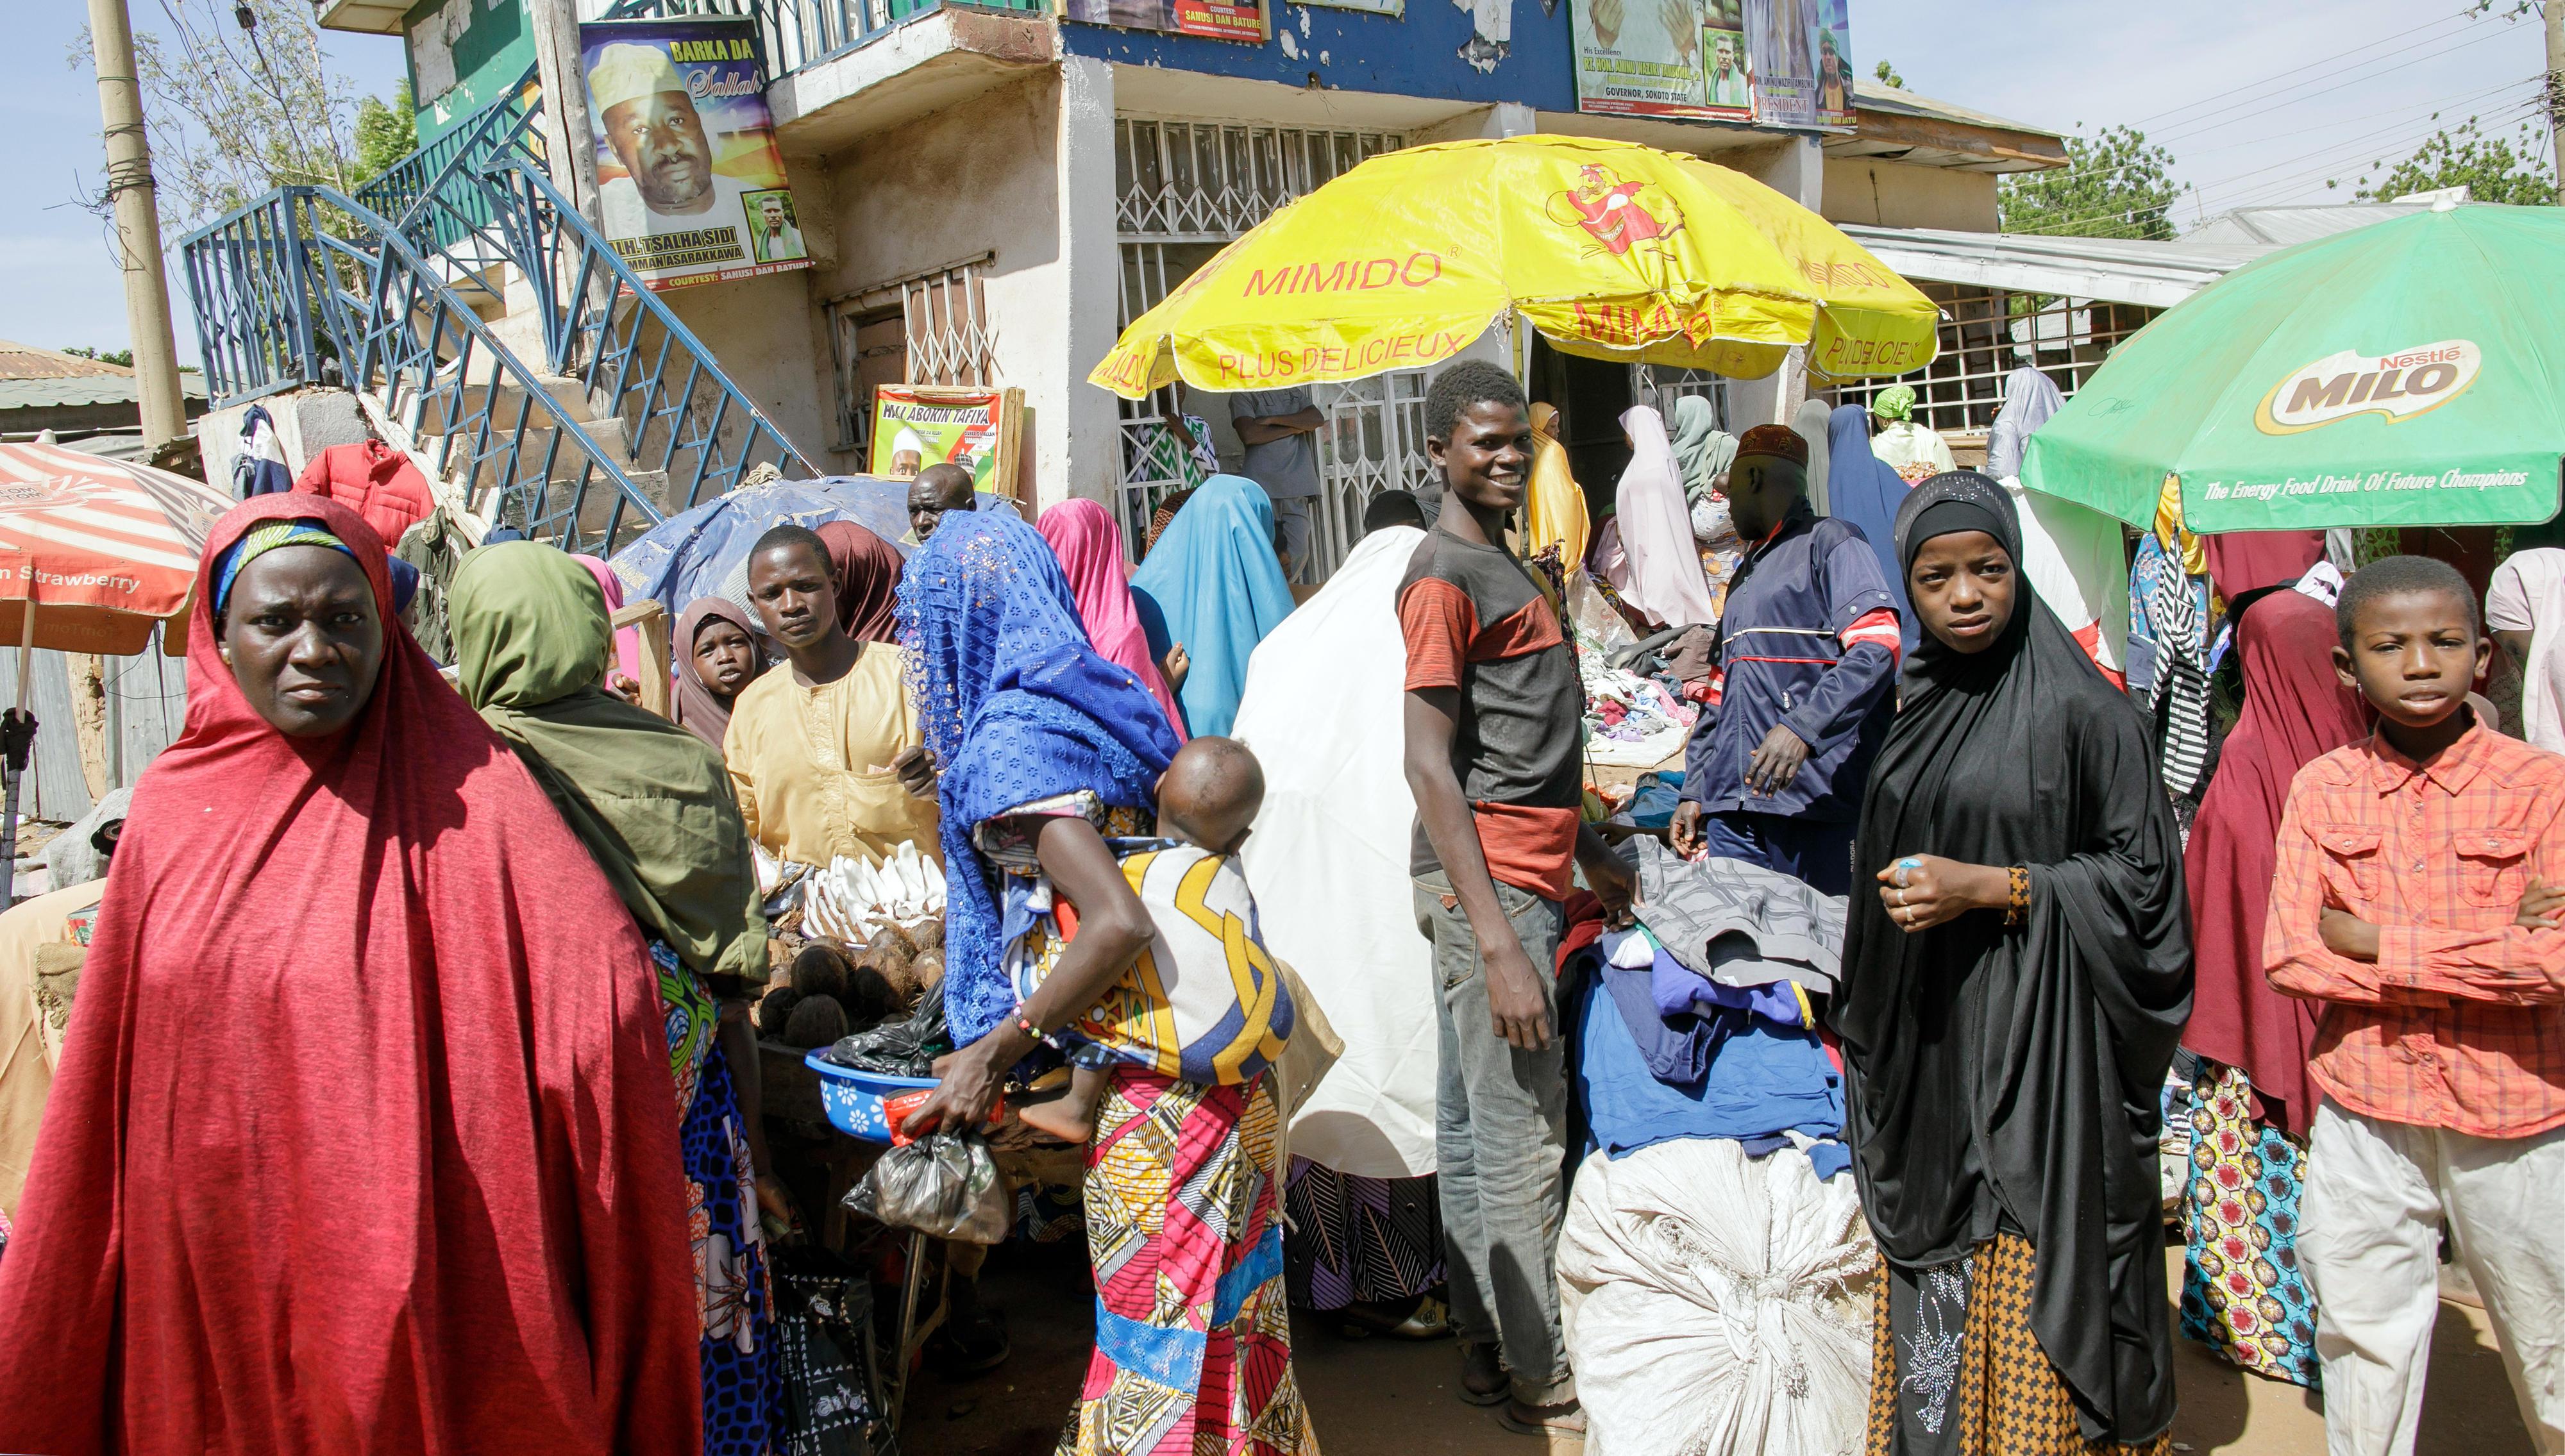 Straßenszene in Sokoto, Nigeria